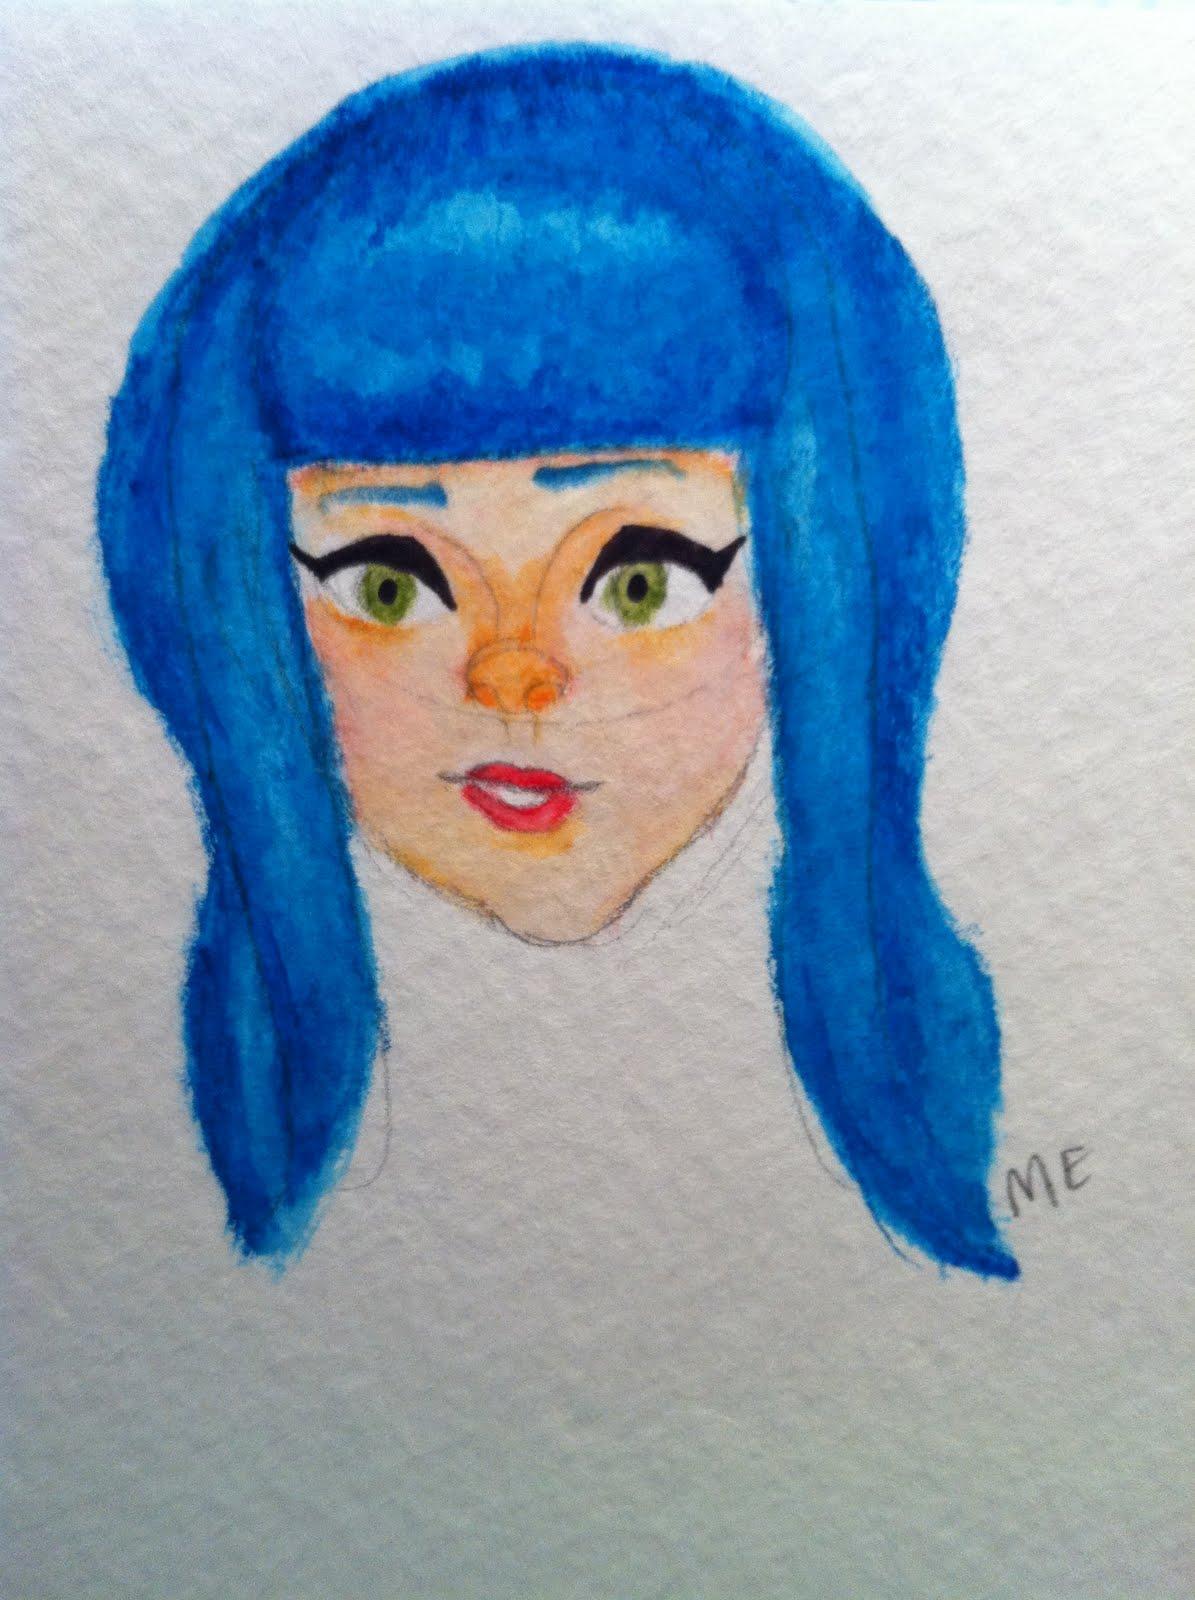 http://2.bp.blogspot.com/-ZpnT3gW4vAk/ThTRspsR-9I/AAAAAAAAAEg/IaNwzwjaEg8/s1600/katy+perry+blue+hair.jpg